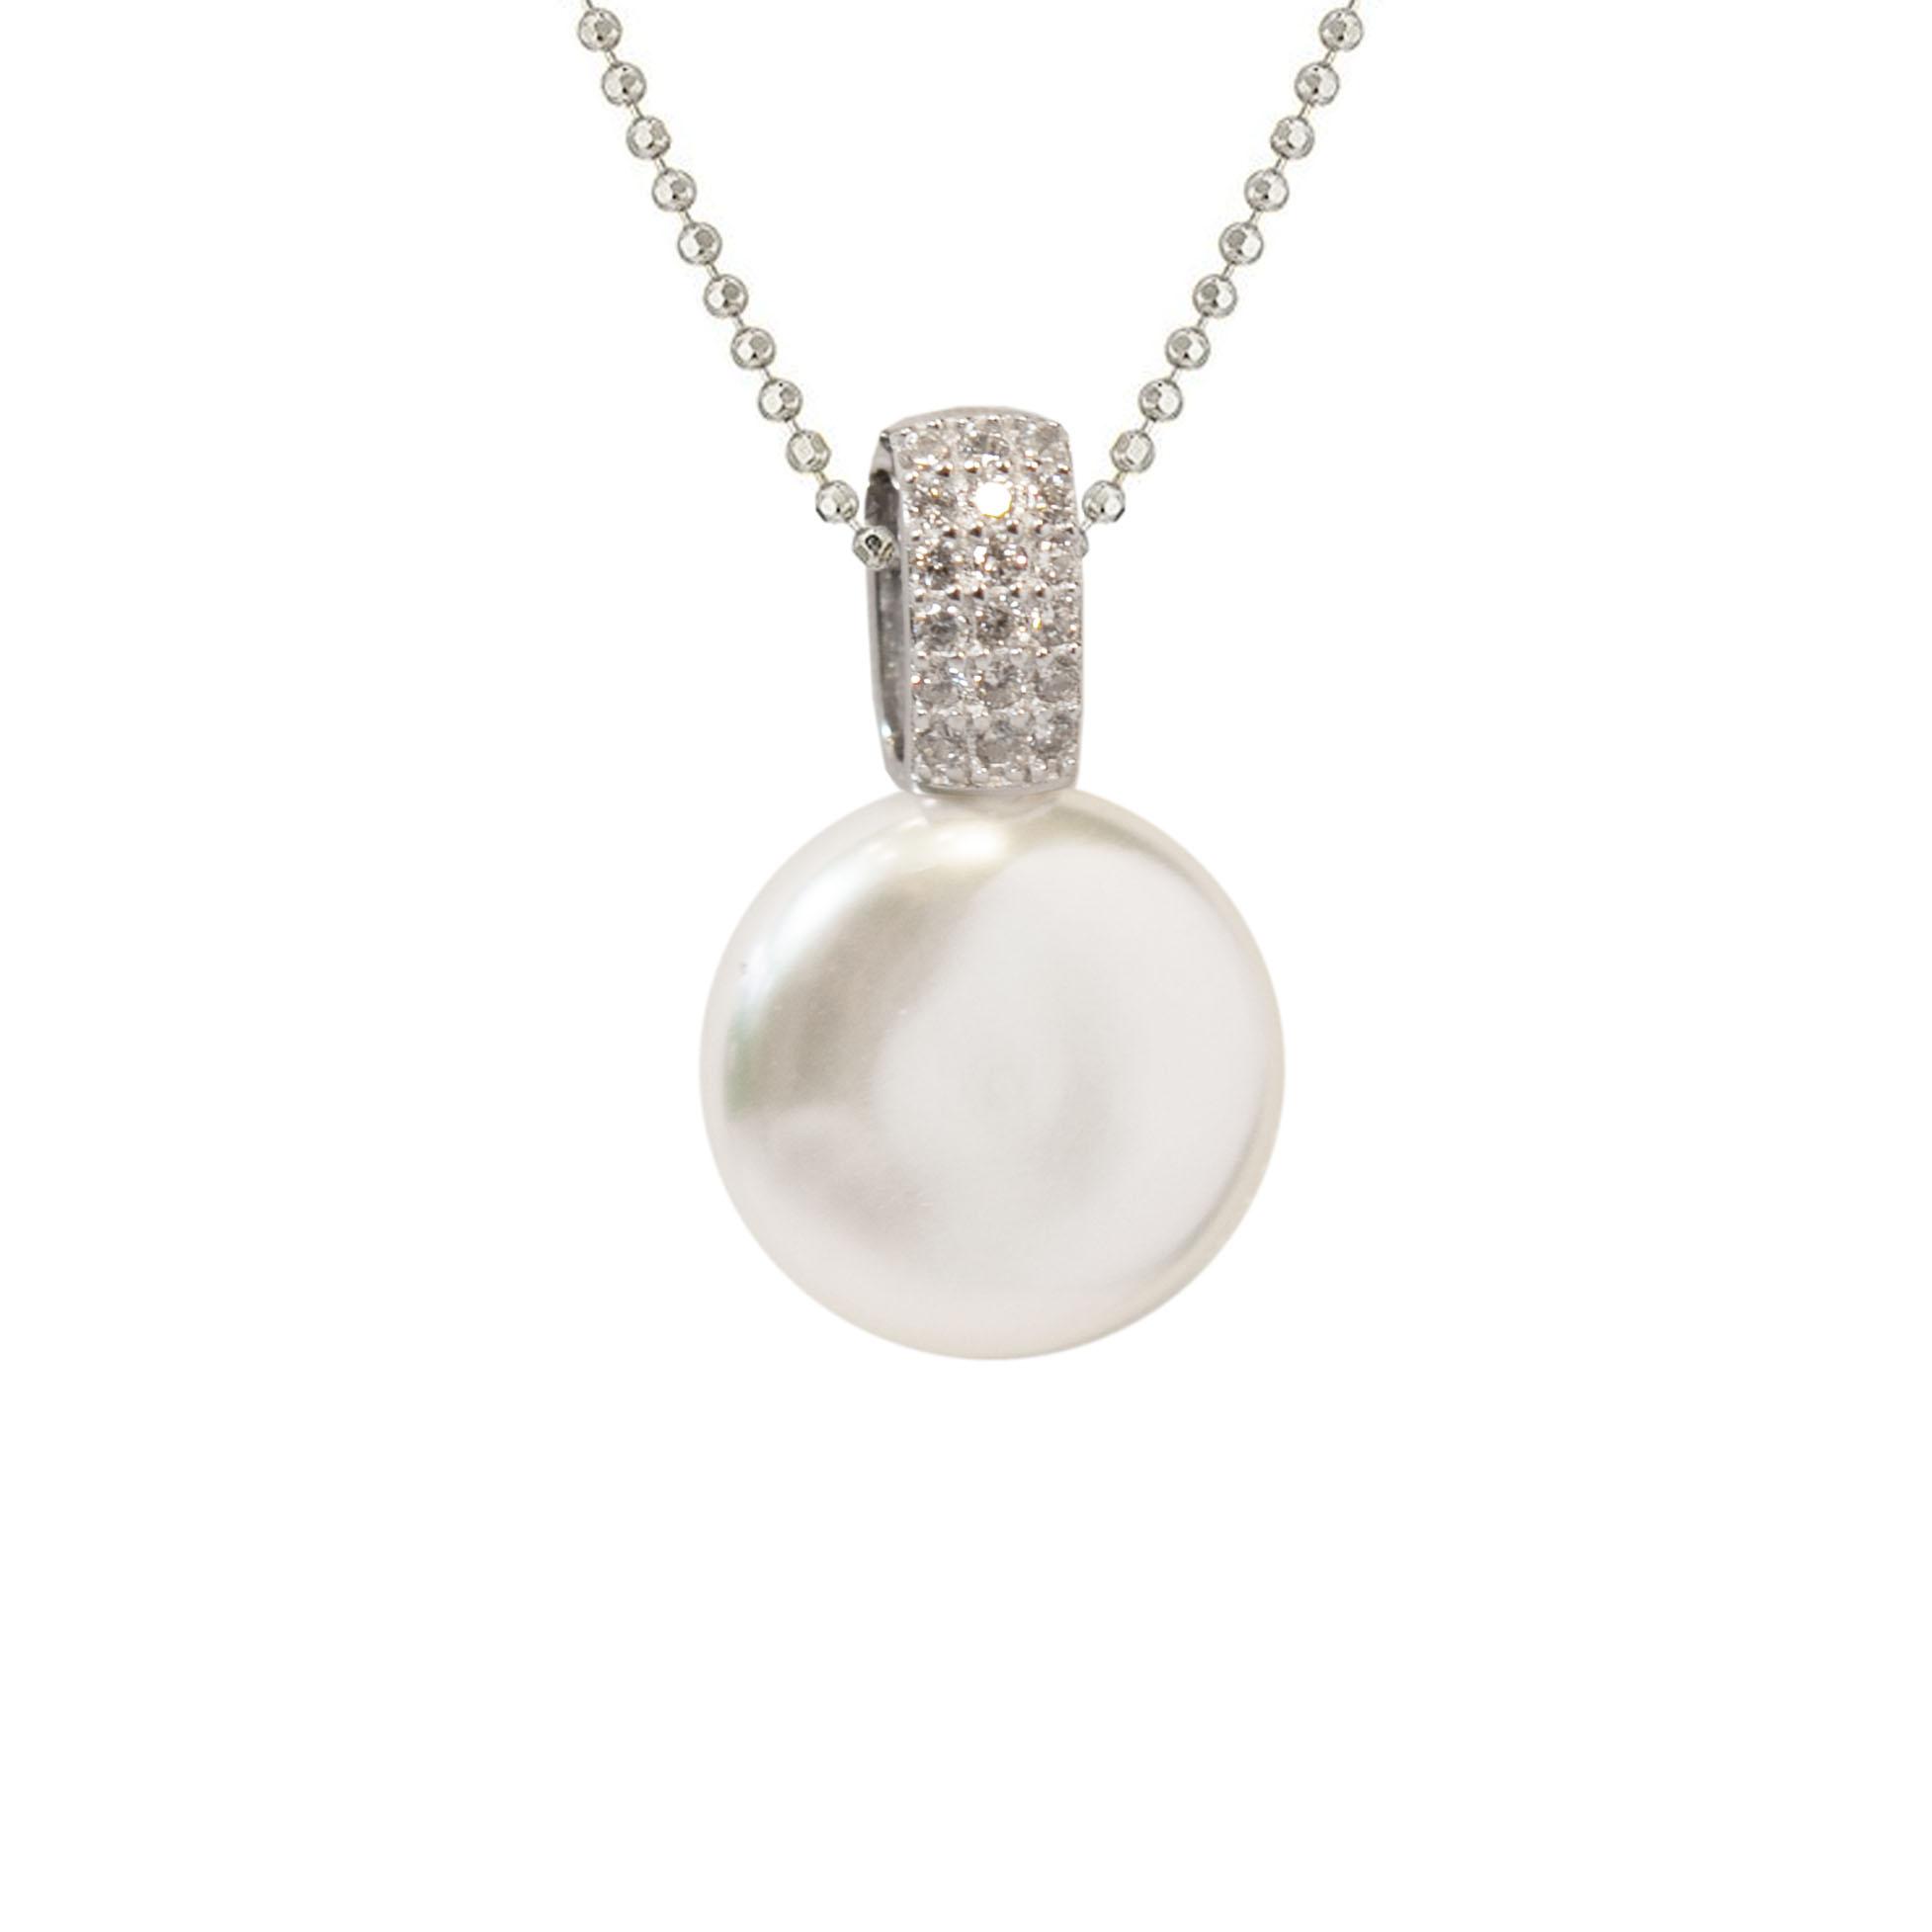 fff04550f Entreat Me Necklace – Simply Marcella